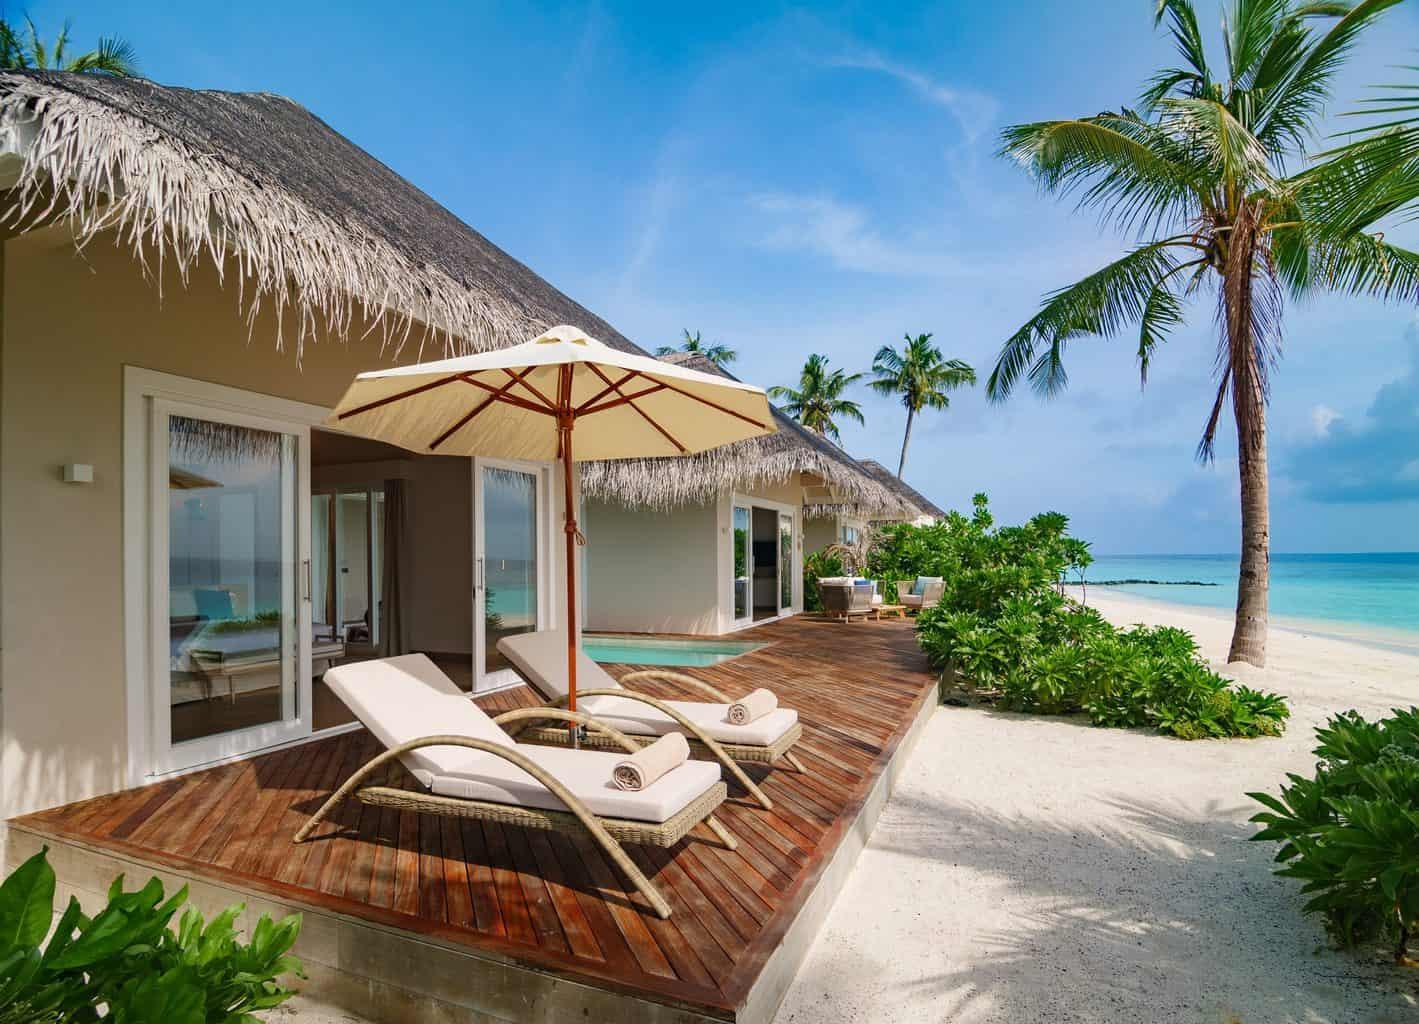 Hoteis-para-Lua-de-Mel-nas-Maldivas-Baglioni-Maldives-4-scaled